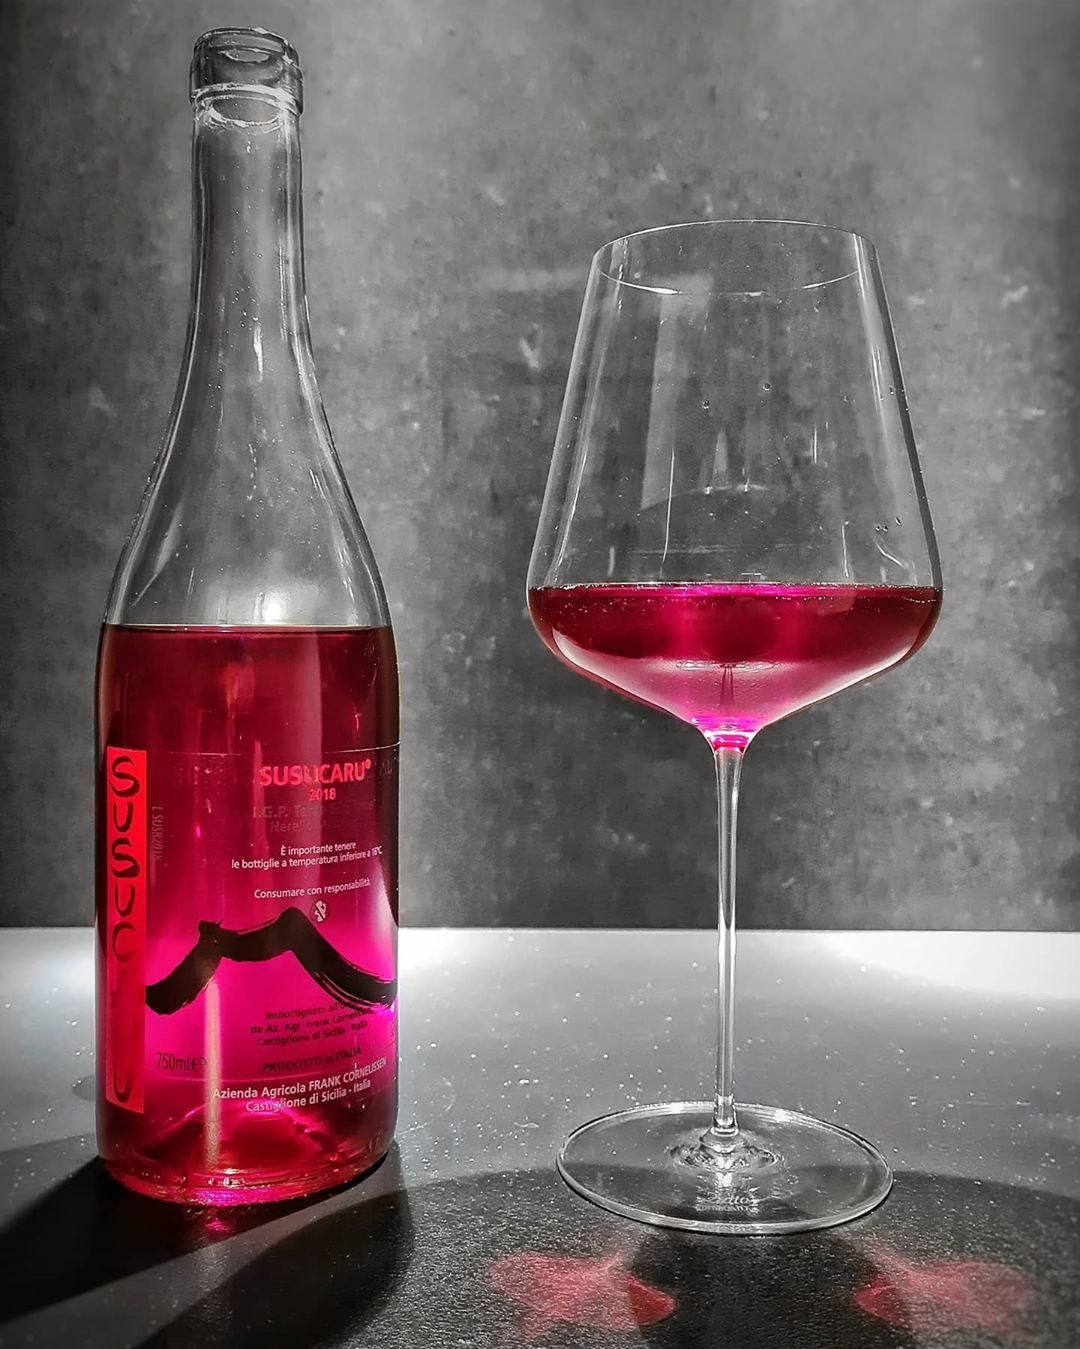 Marcel De Cocq On Instagram And There It Is 2018 Susucaru Rosso Frank Cornelissen 85 Nerello Mascalese Sicili Etna In 2020 Wine Bottle Wino Light Red